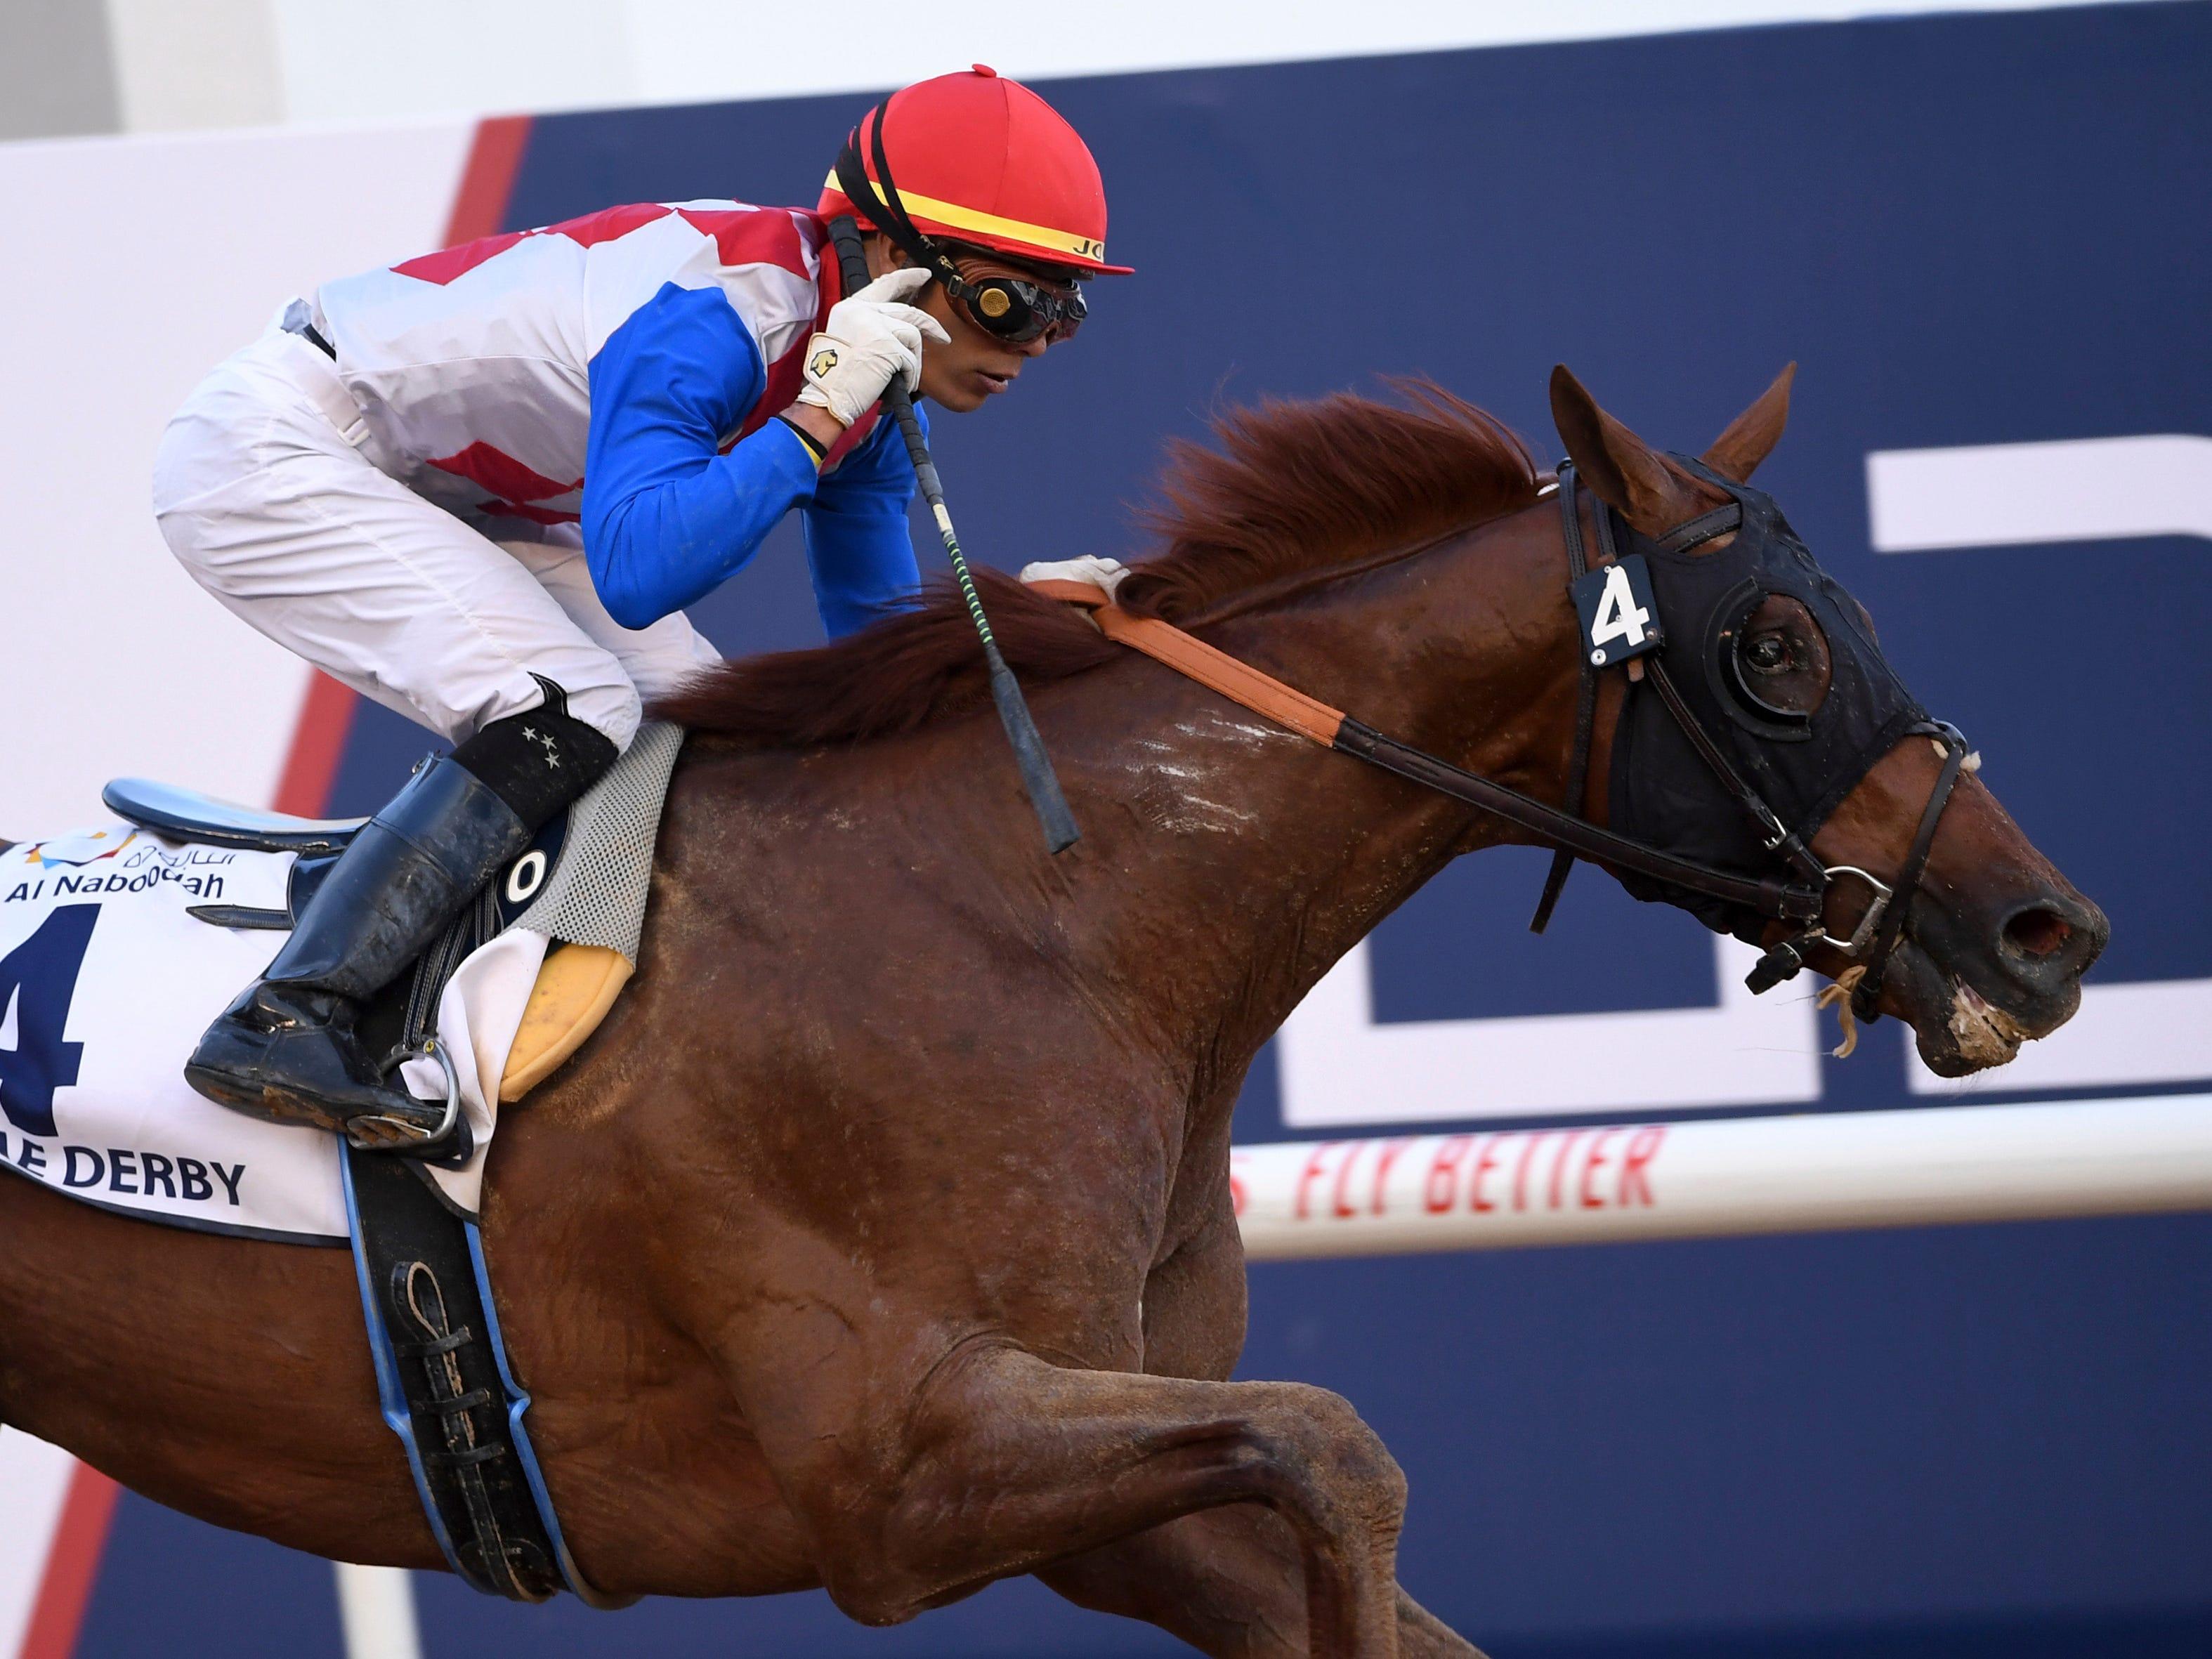 Plus Que Parfait, with jockey Jose Ortiz ,wins the $2.5 million Group 2 UAE Derby in Dubai, United Arab Emirates, Saturday, March 30, 2019.